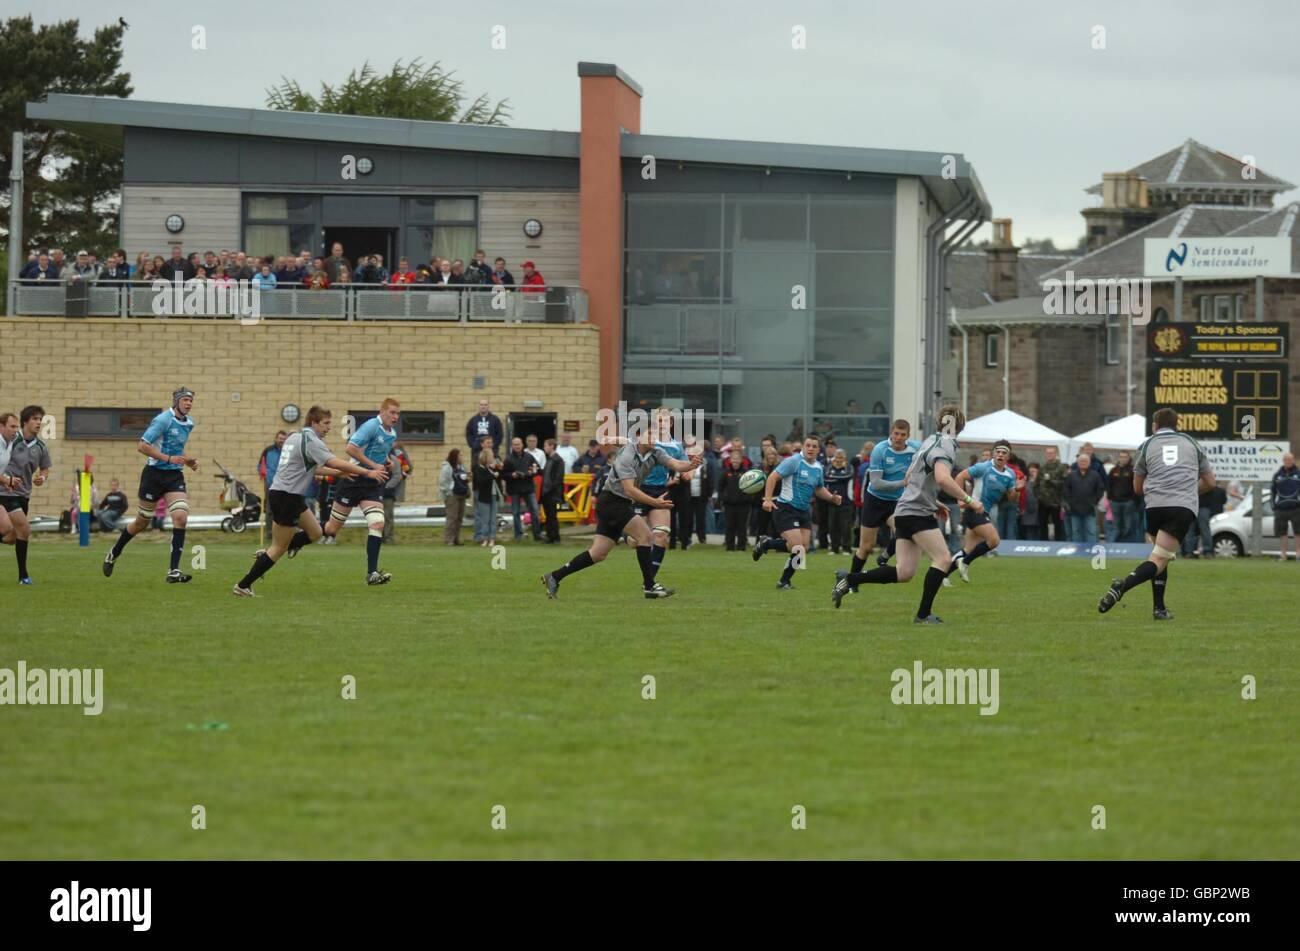 Rugby Union - IRB World Cup Warm up match - Scotland Under 20's v Ireland Under 20's - Fort Matilda Rugby Club Stock Photo